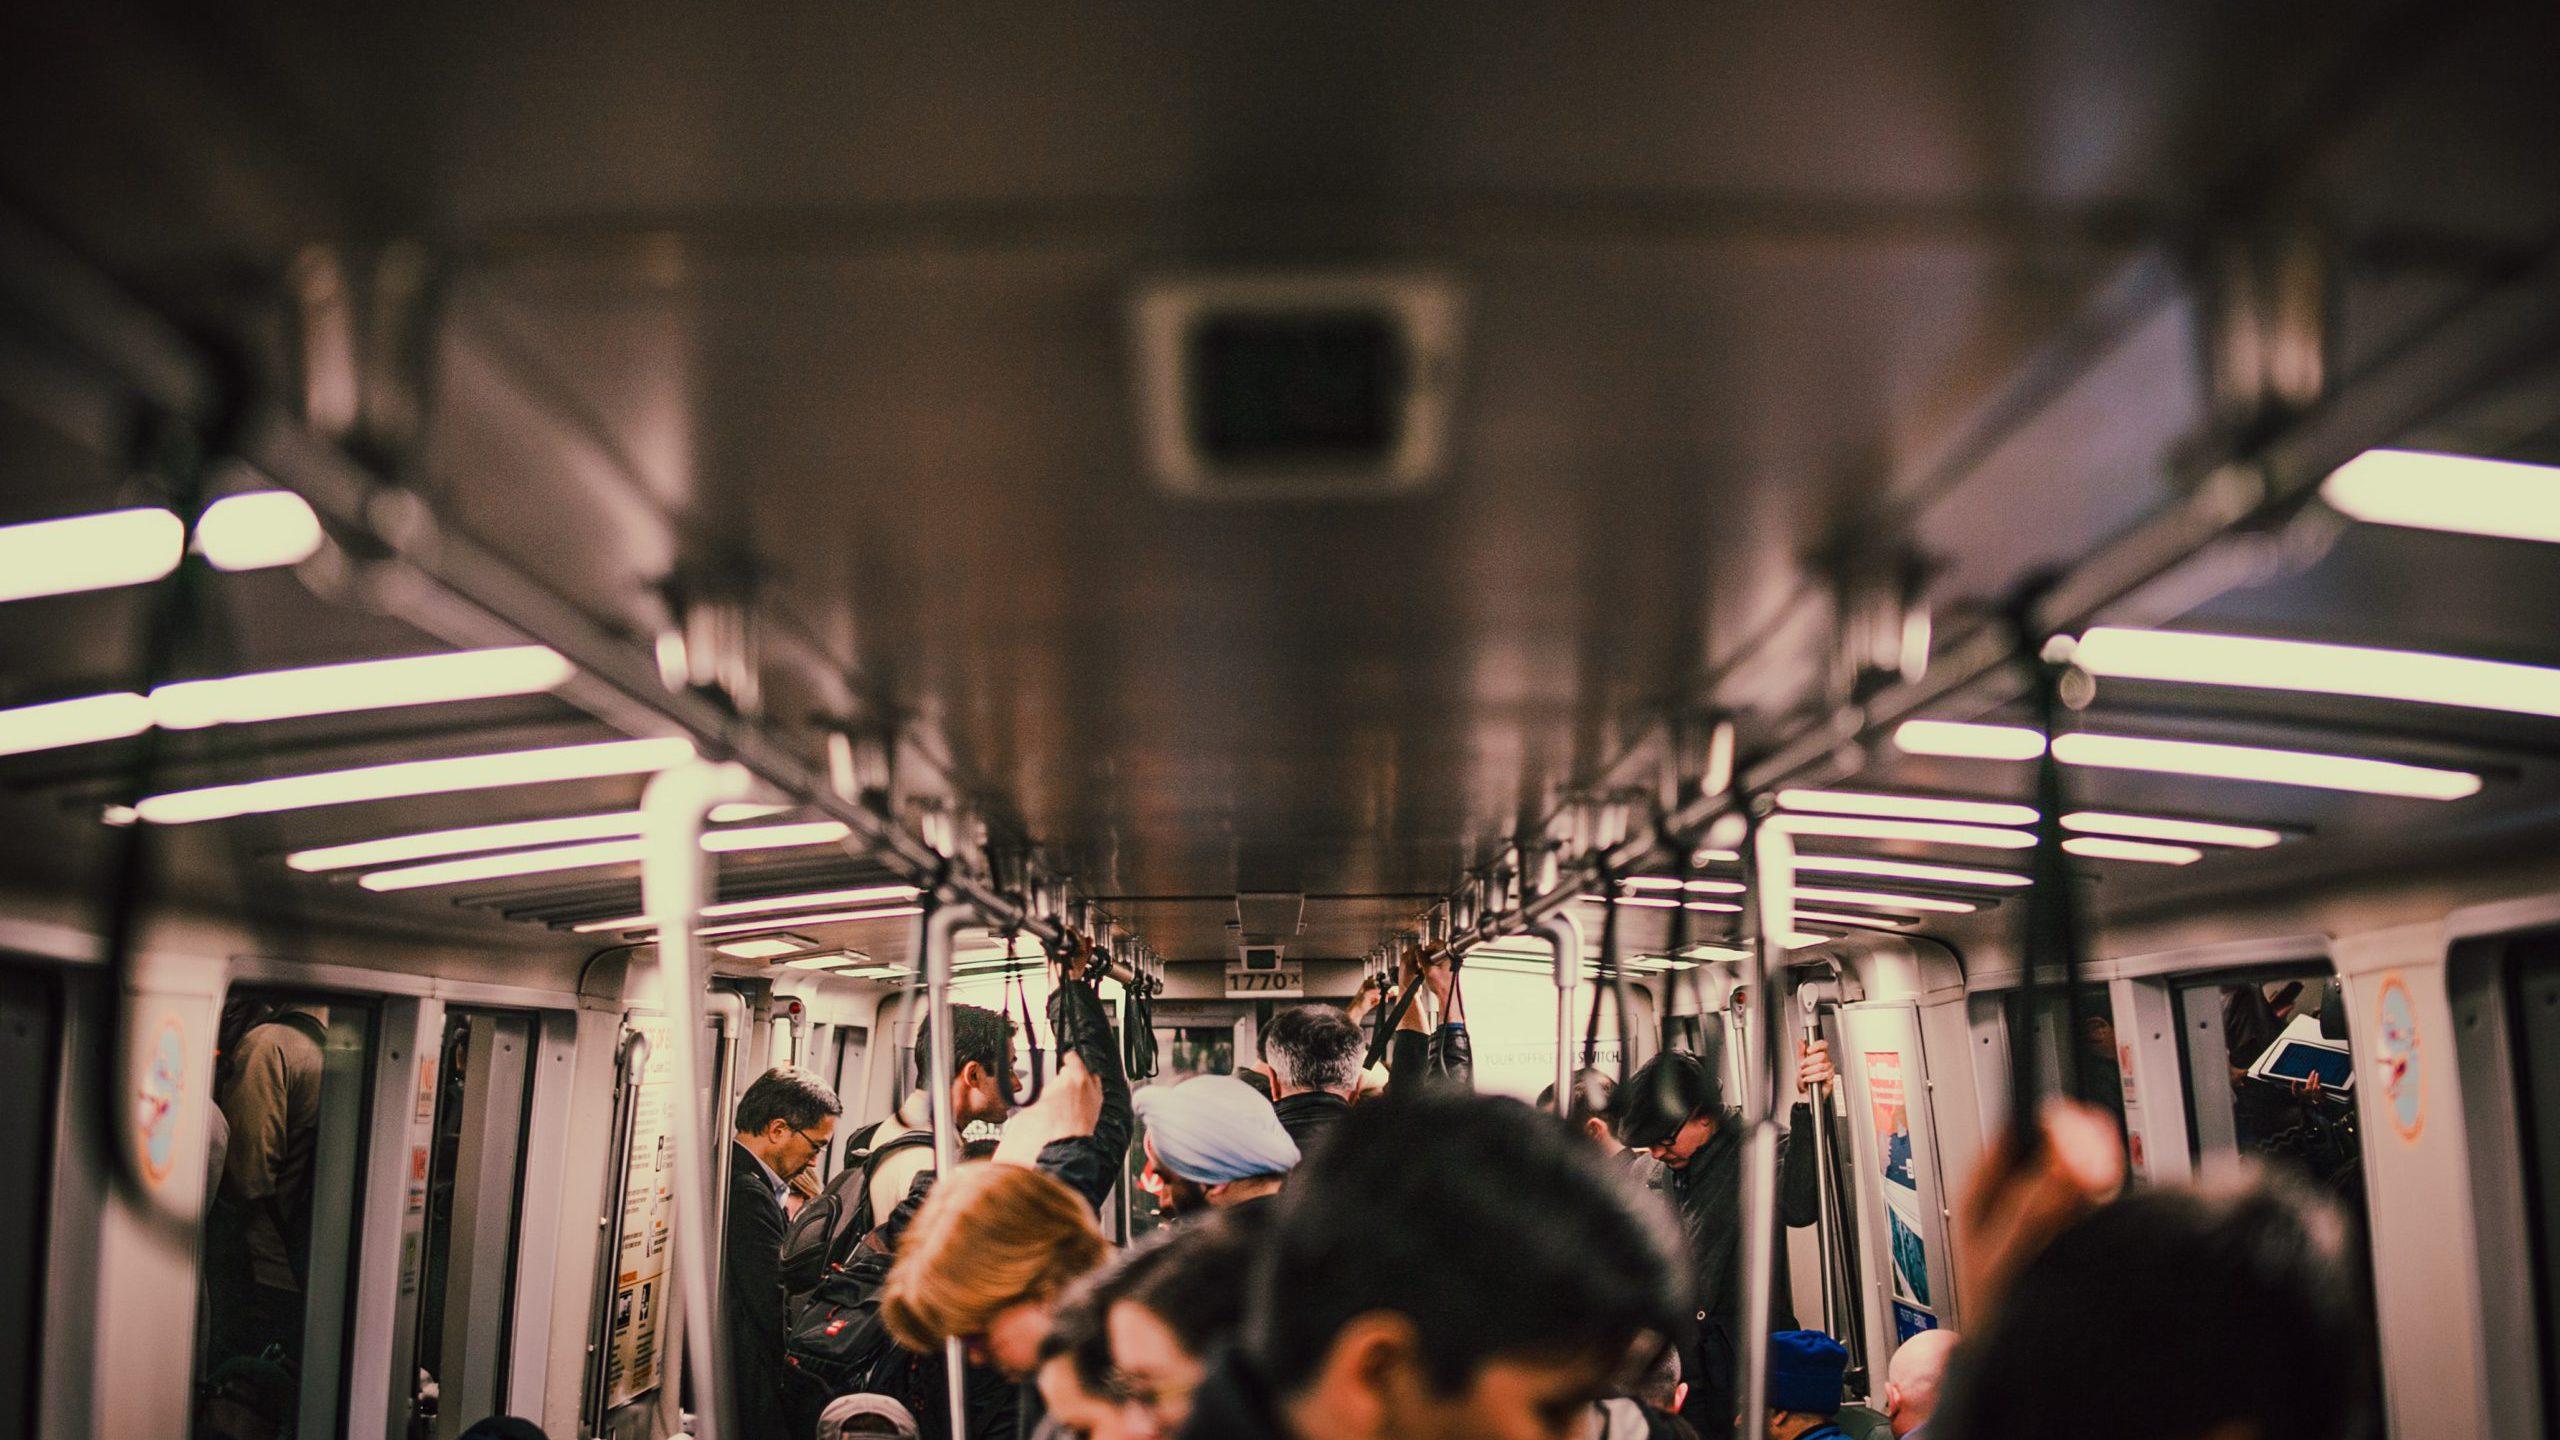 Optimism Growing for an Improving Job Market